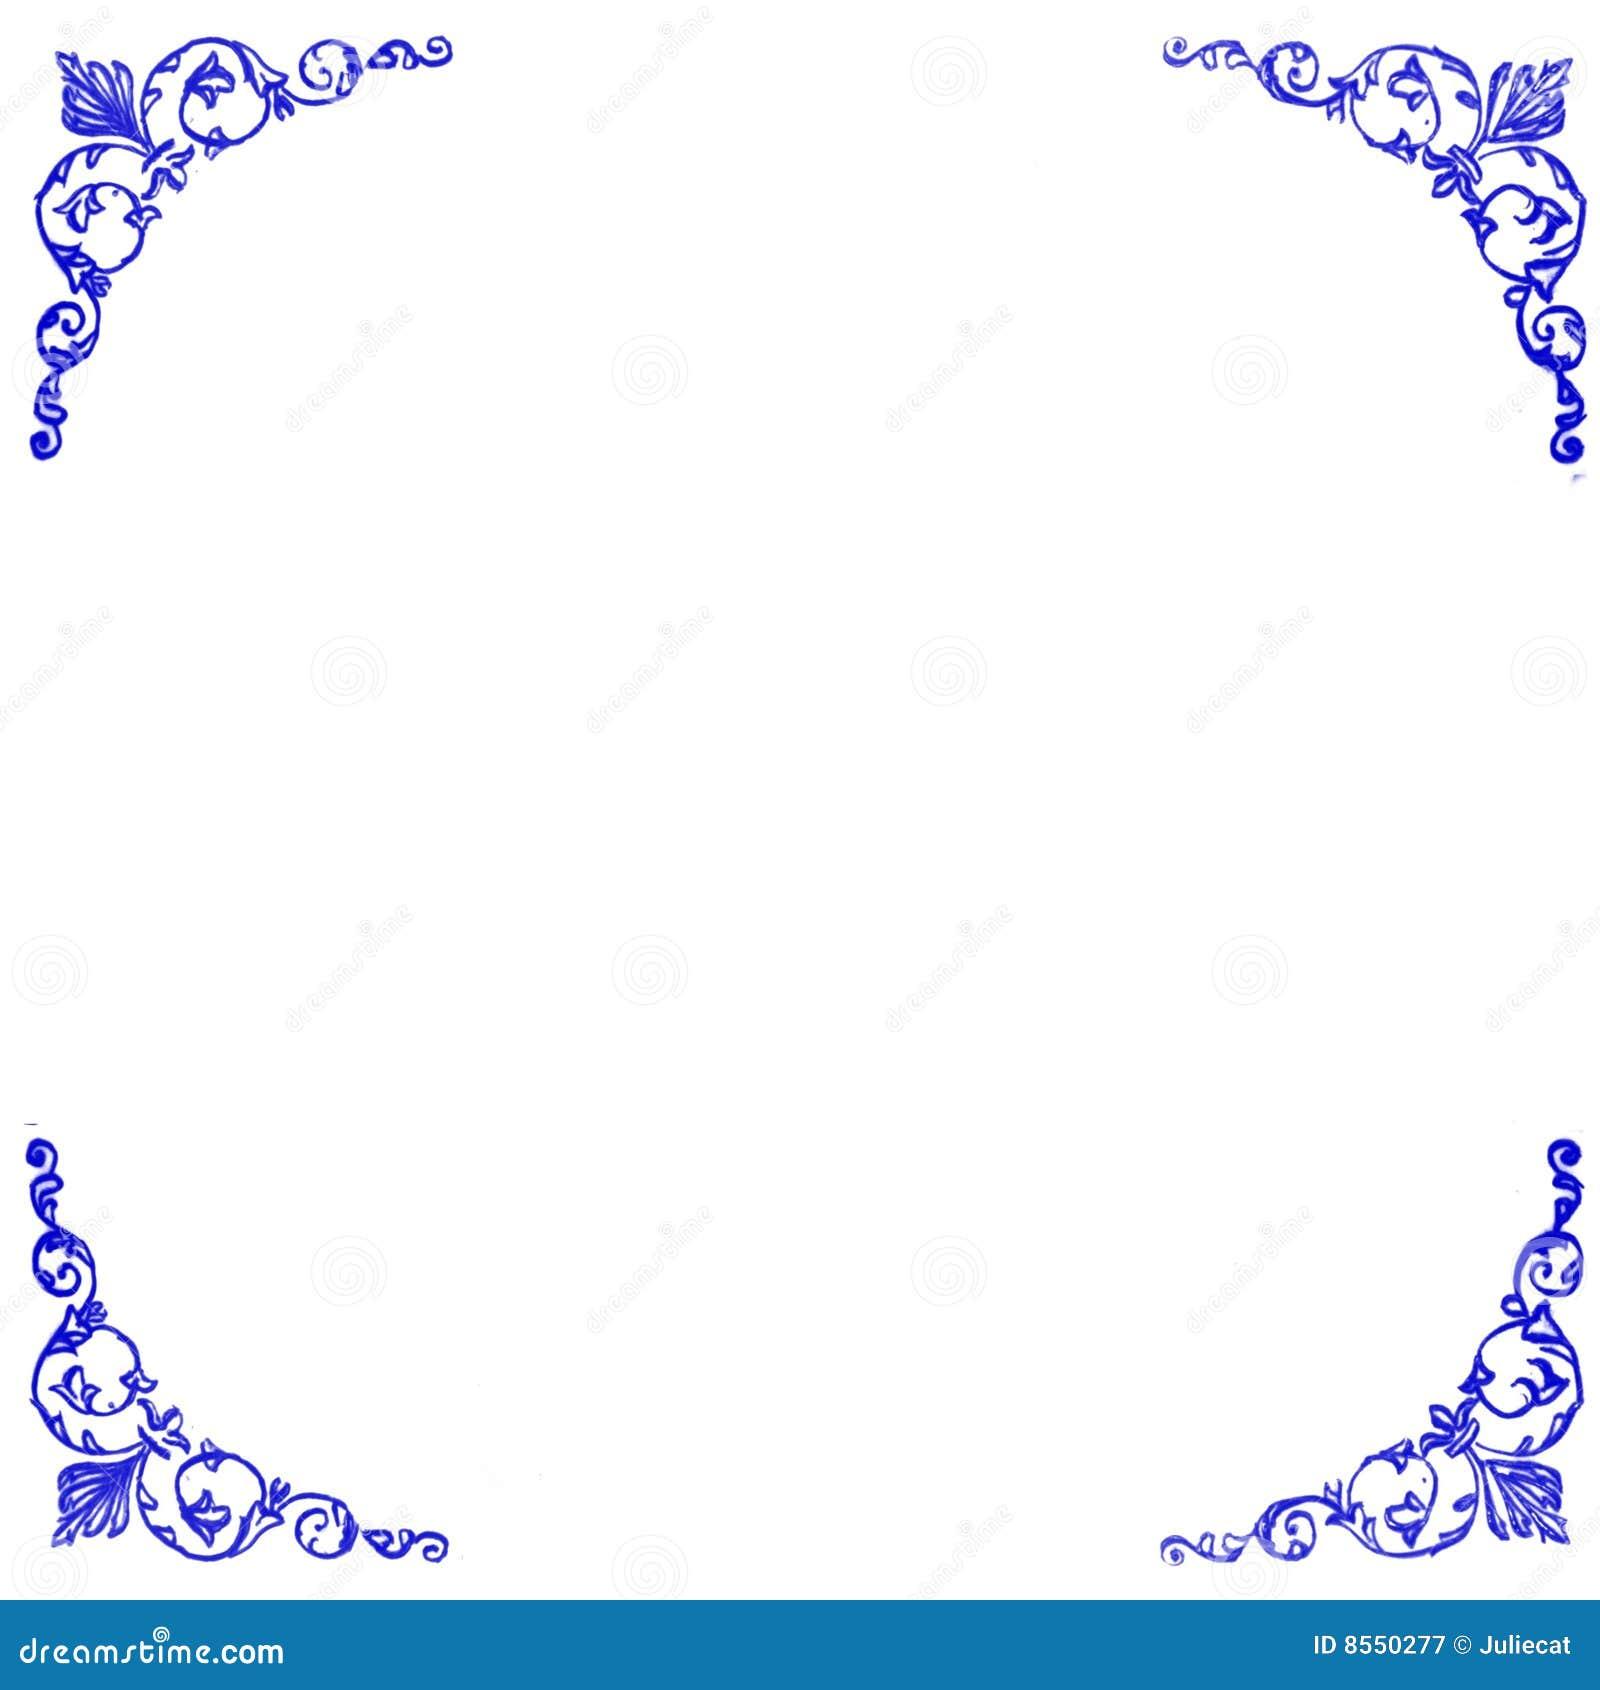 Decorative Blue Corners Background Royalty Free Stock ...